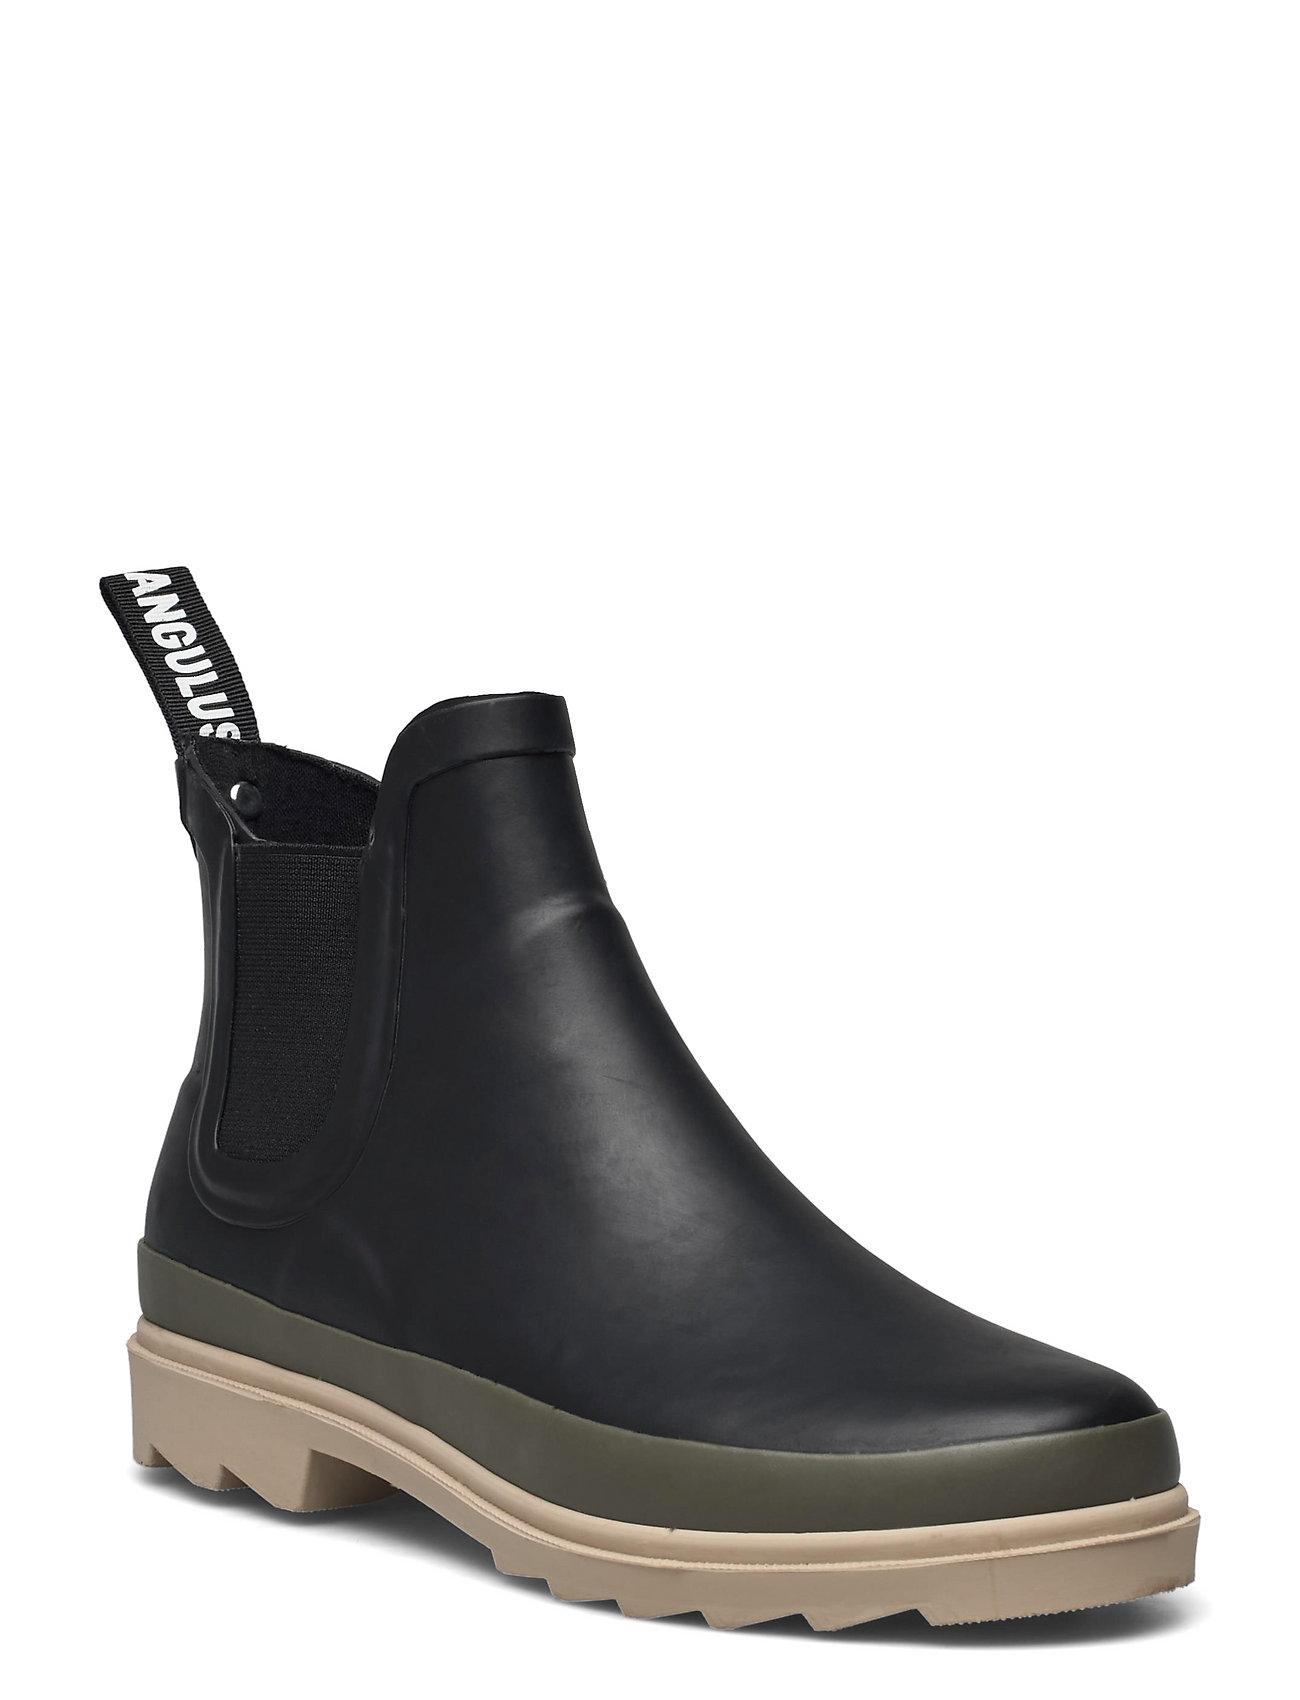 Rain Boots - Low With Elastic Gummistøvler Sko Sort ANGULUS